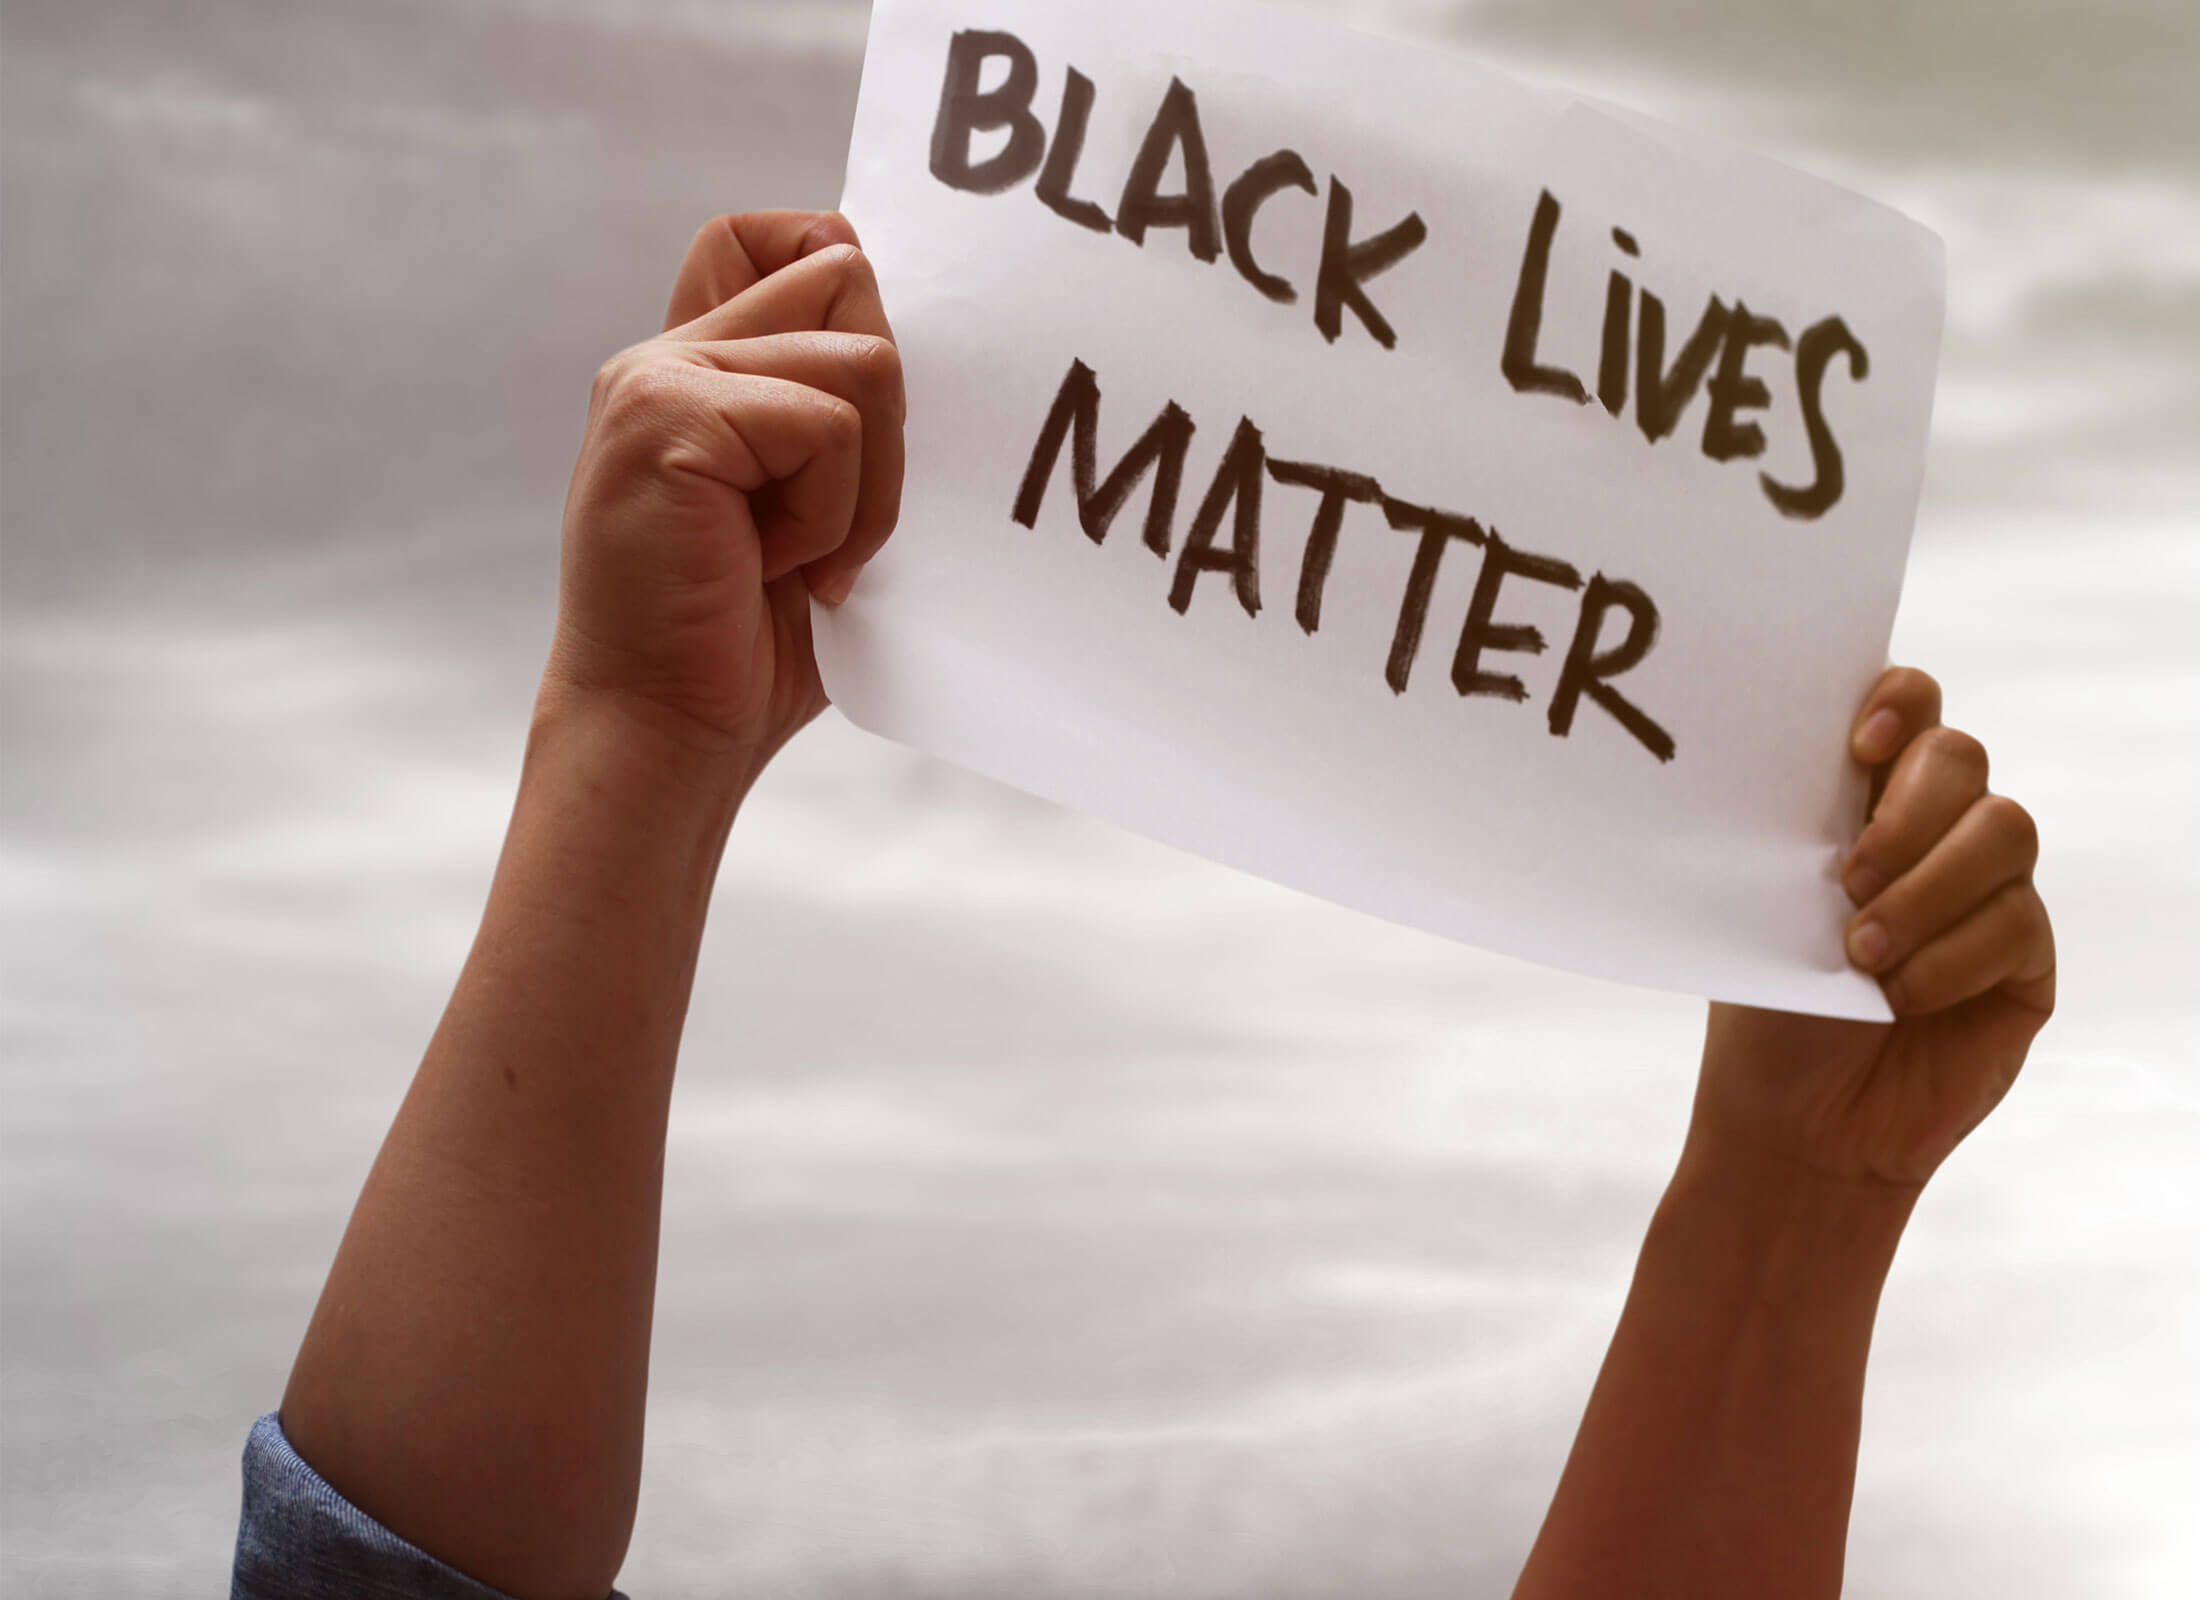 Black Lives Matter, Rassismus, Demonstrant mit Schild